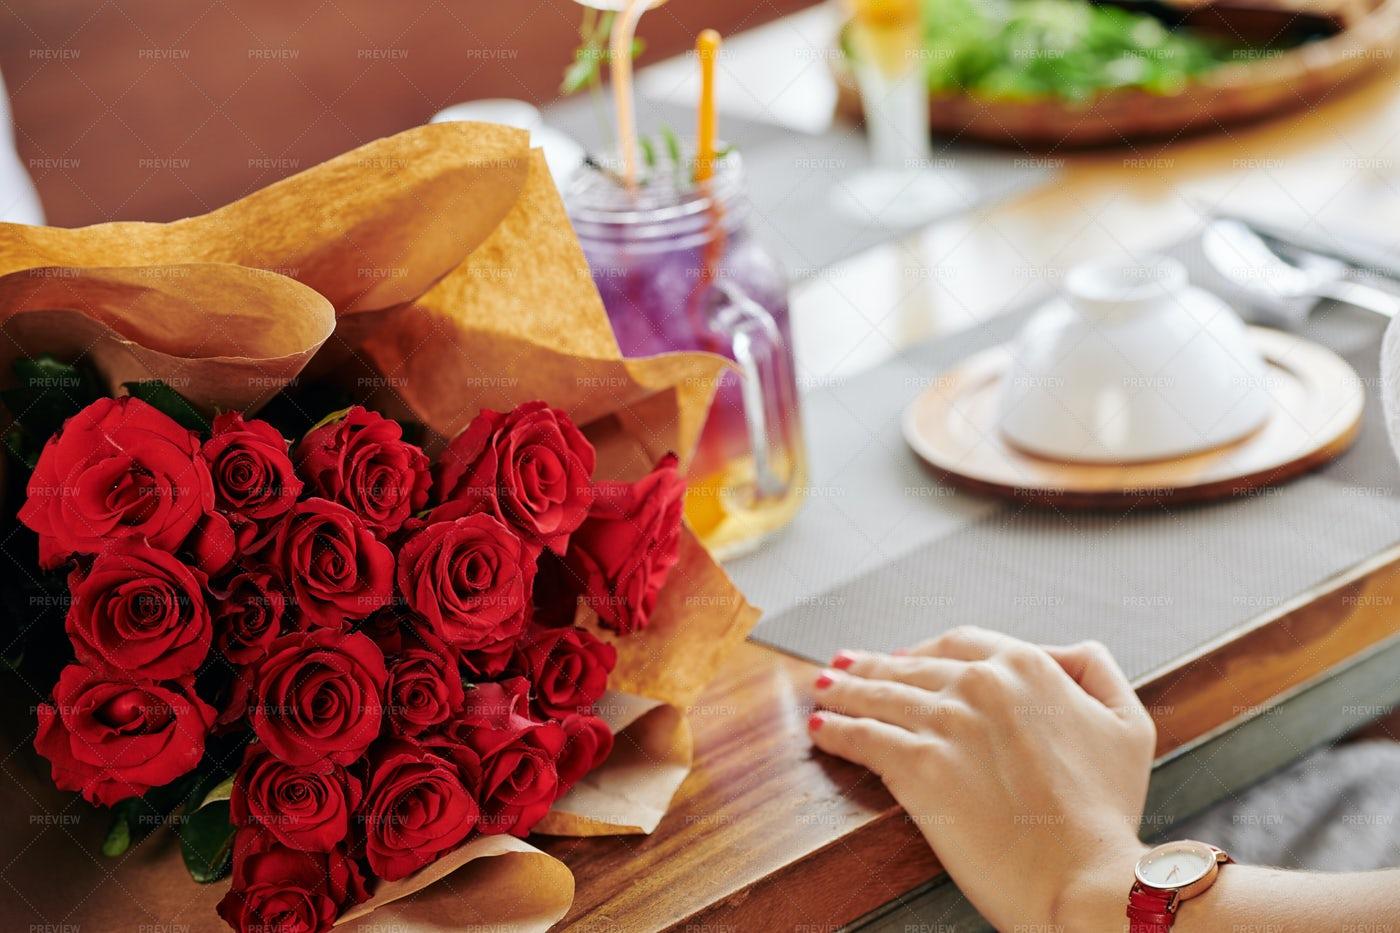 Big Bouquet Of Roses: Stock Photos